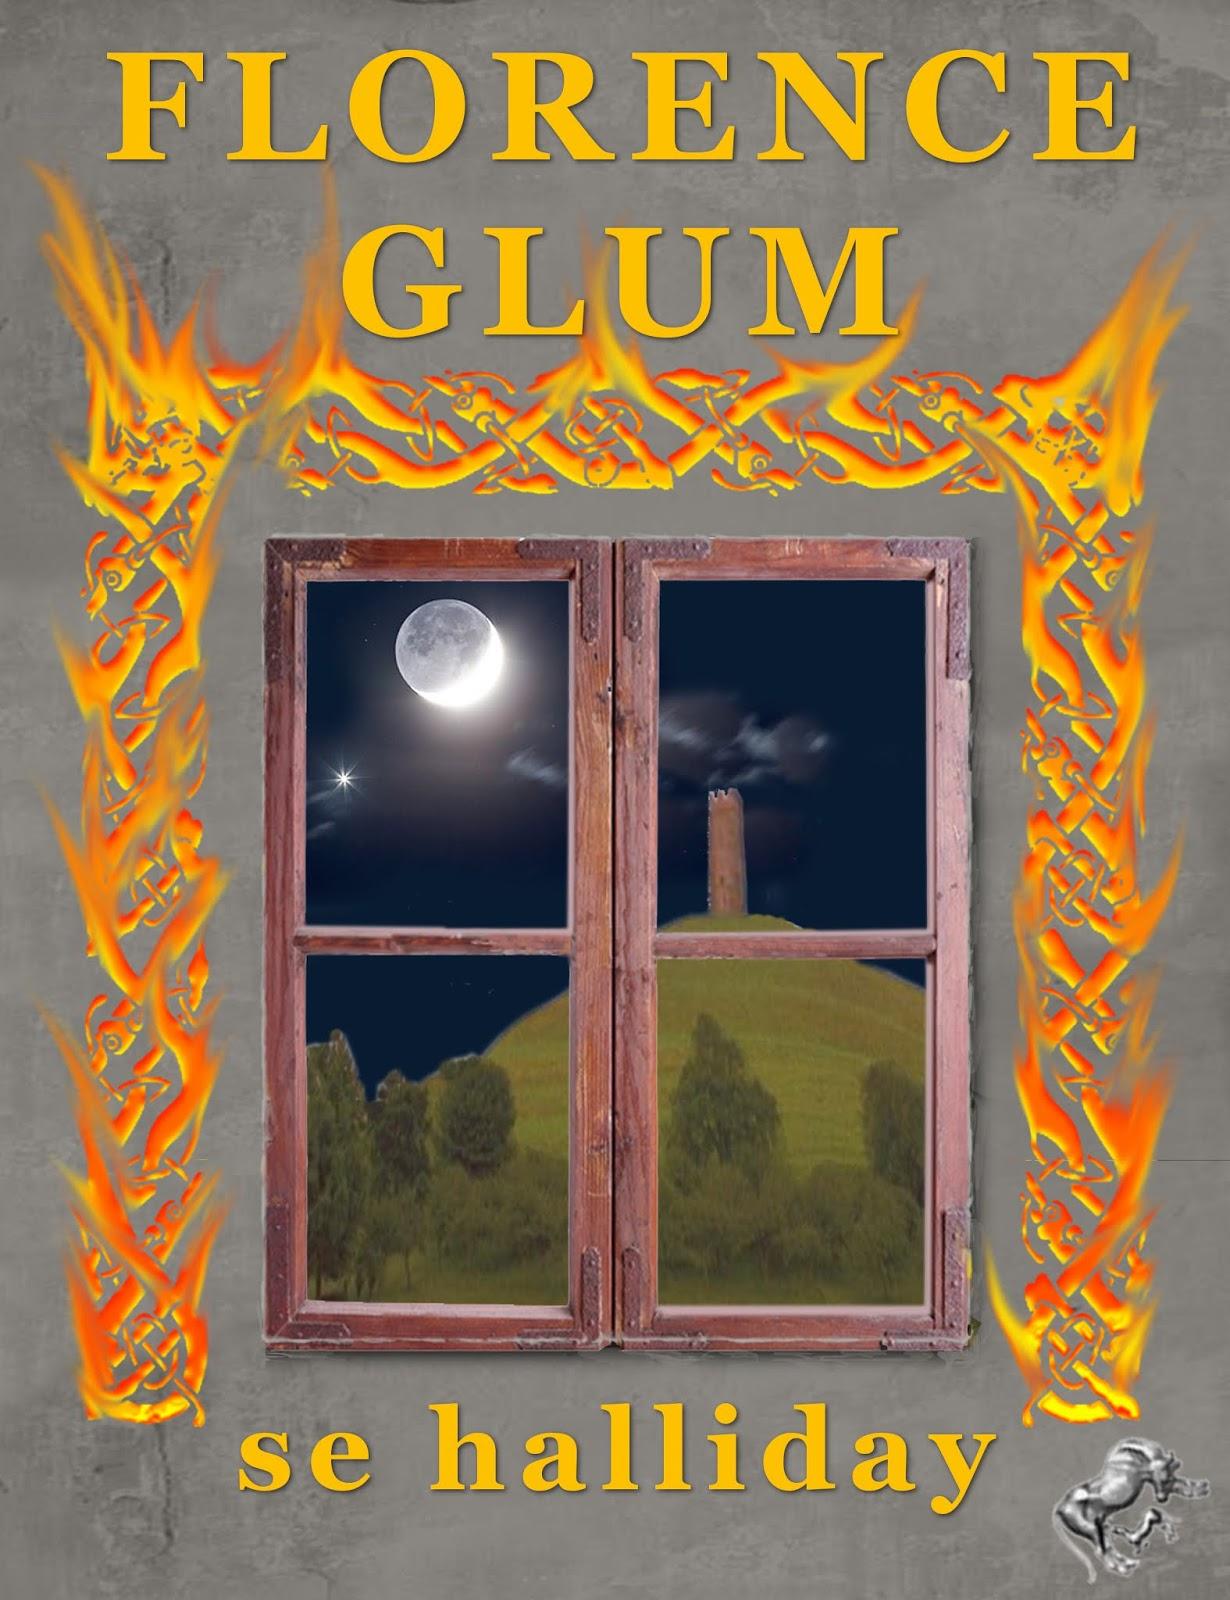 Florence Glum